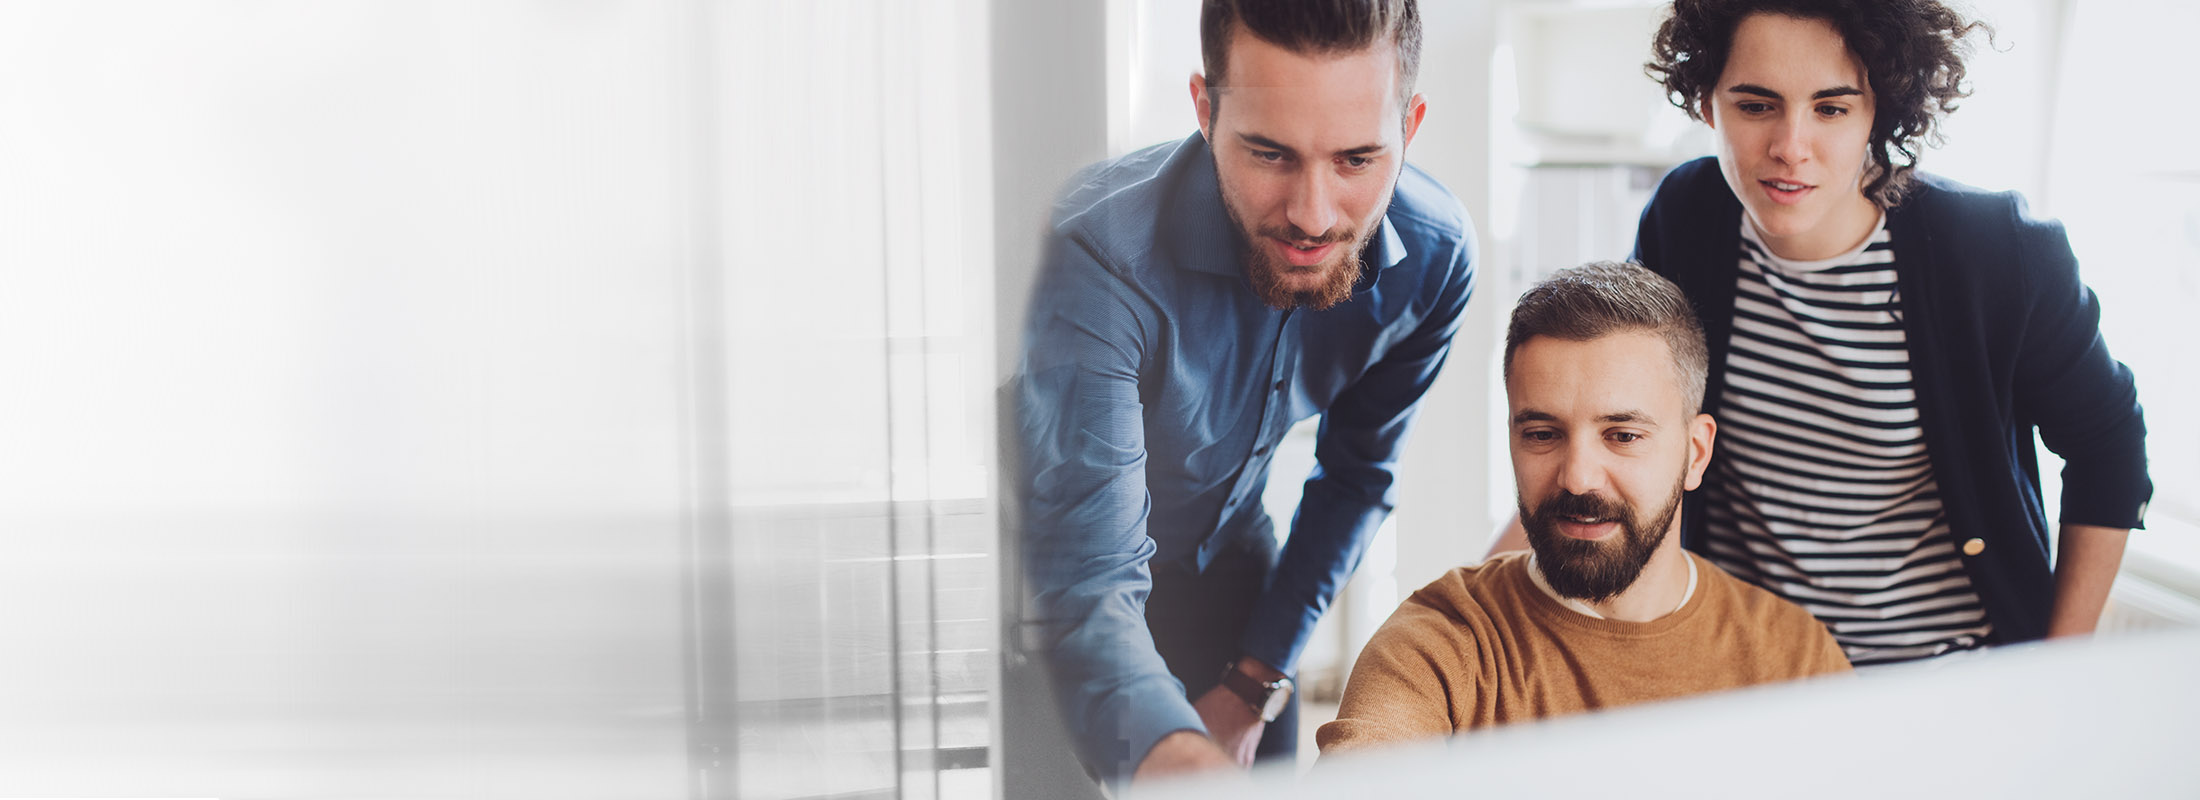 CPRO INDUSTRY SAP Meldungsbearbeitung